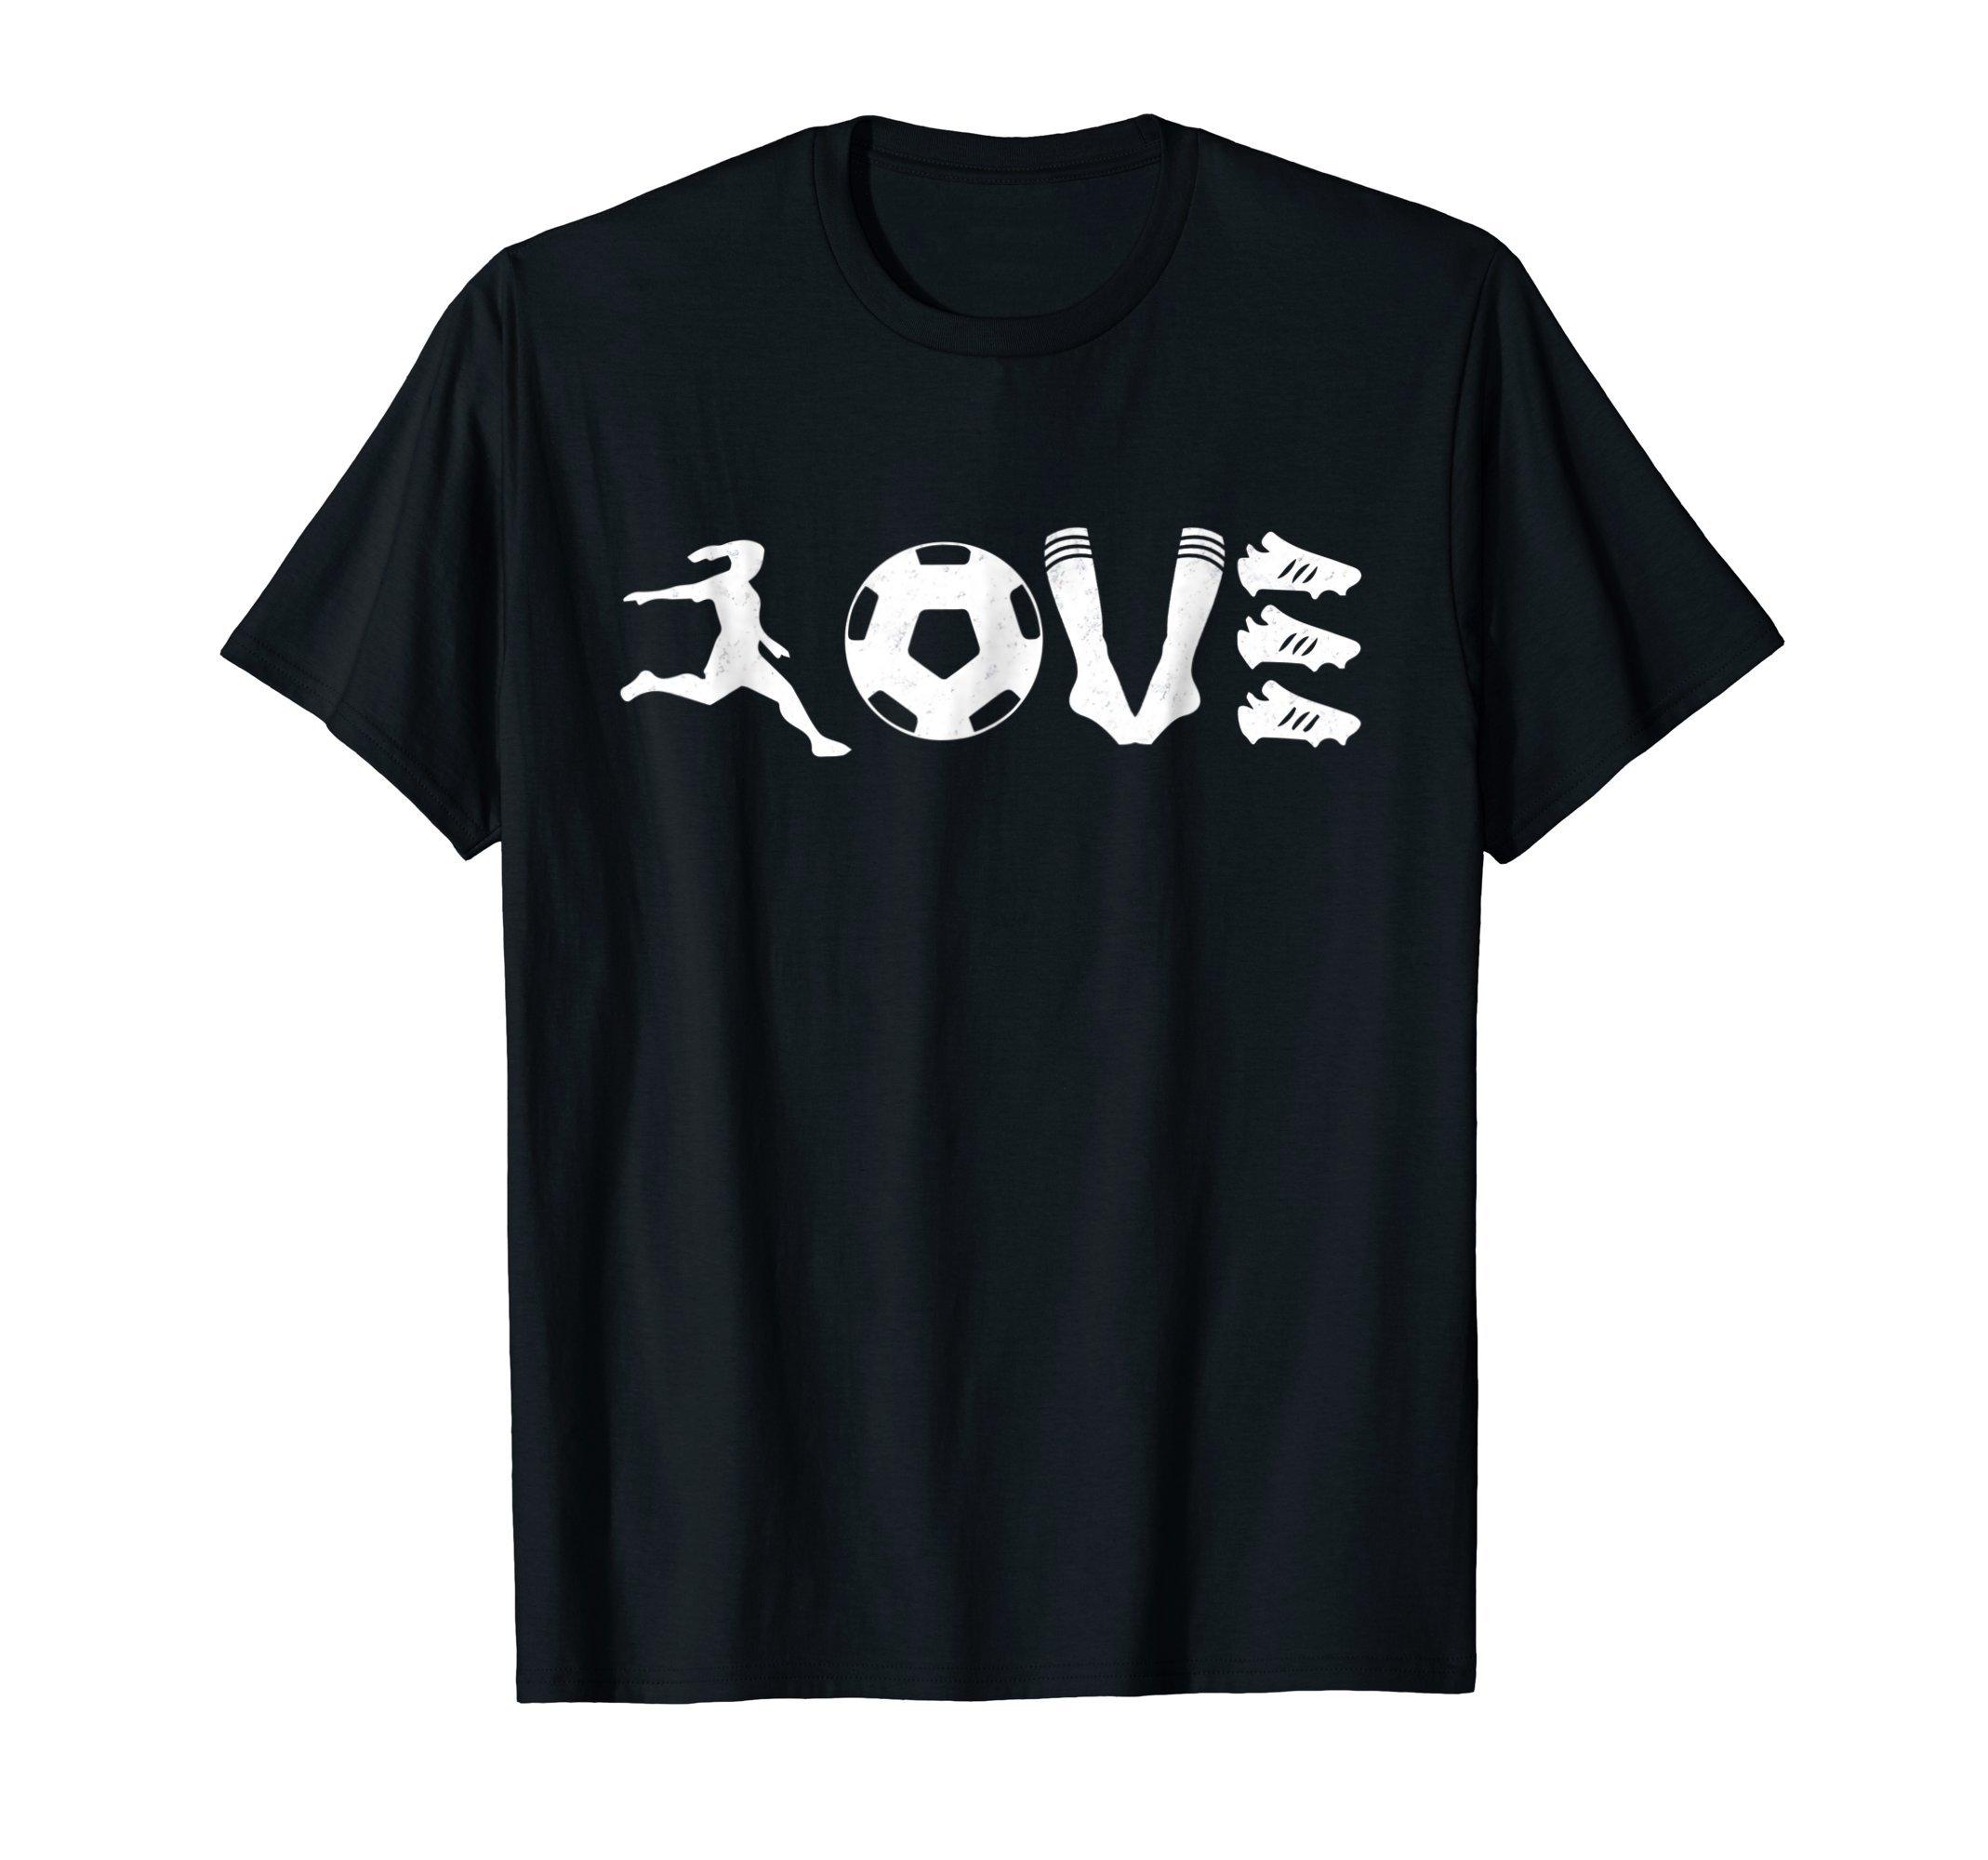 Vintage Soccer Football T-Shirt I Love Soccer